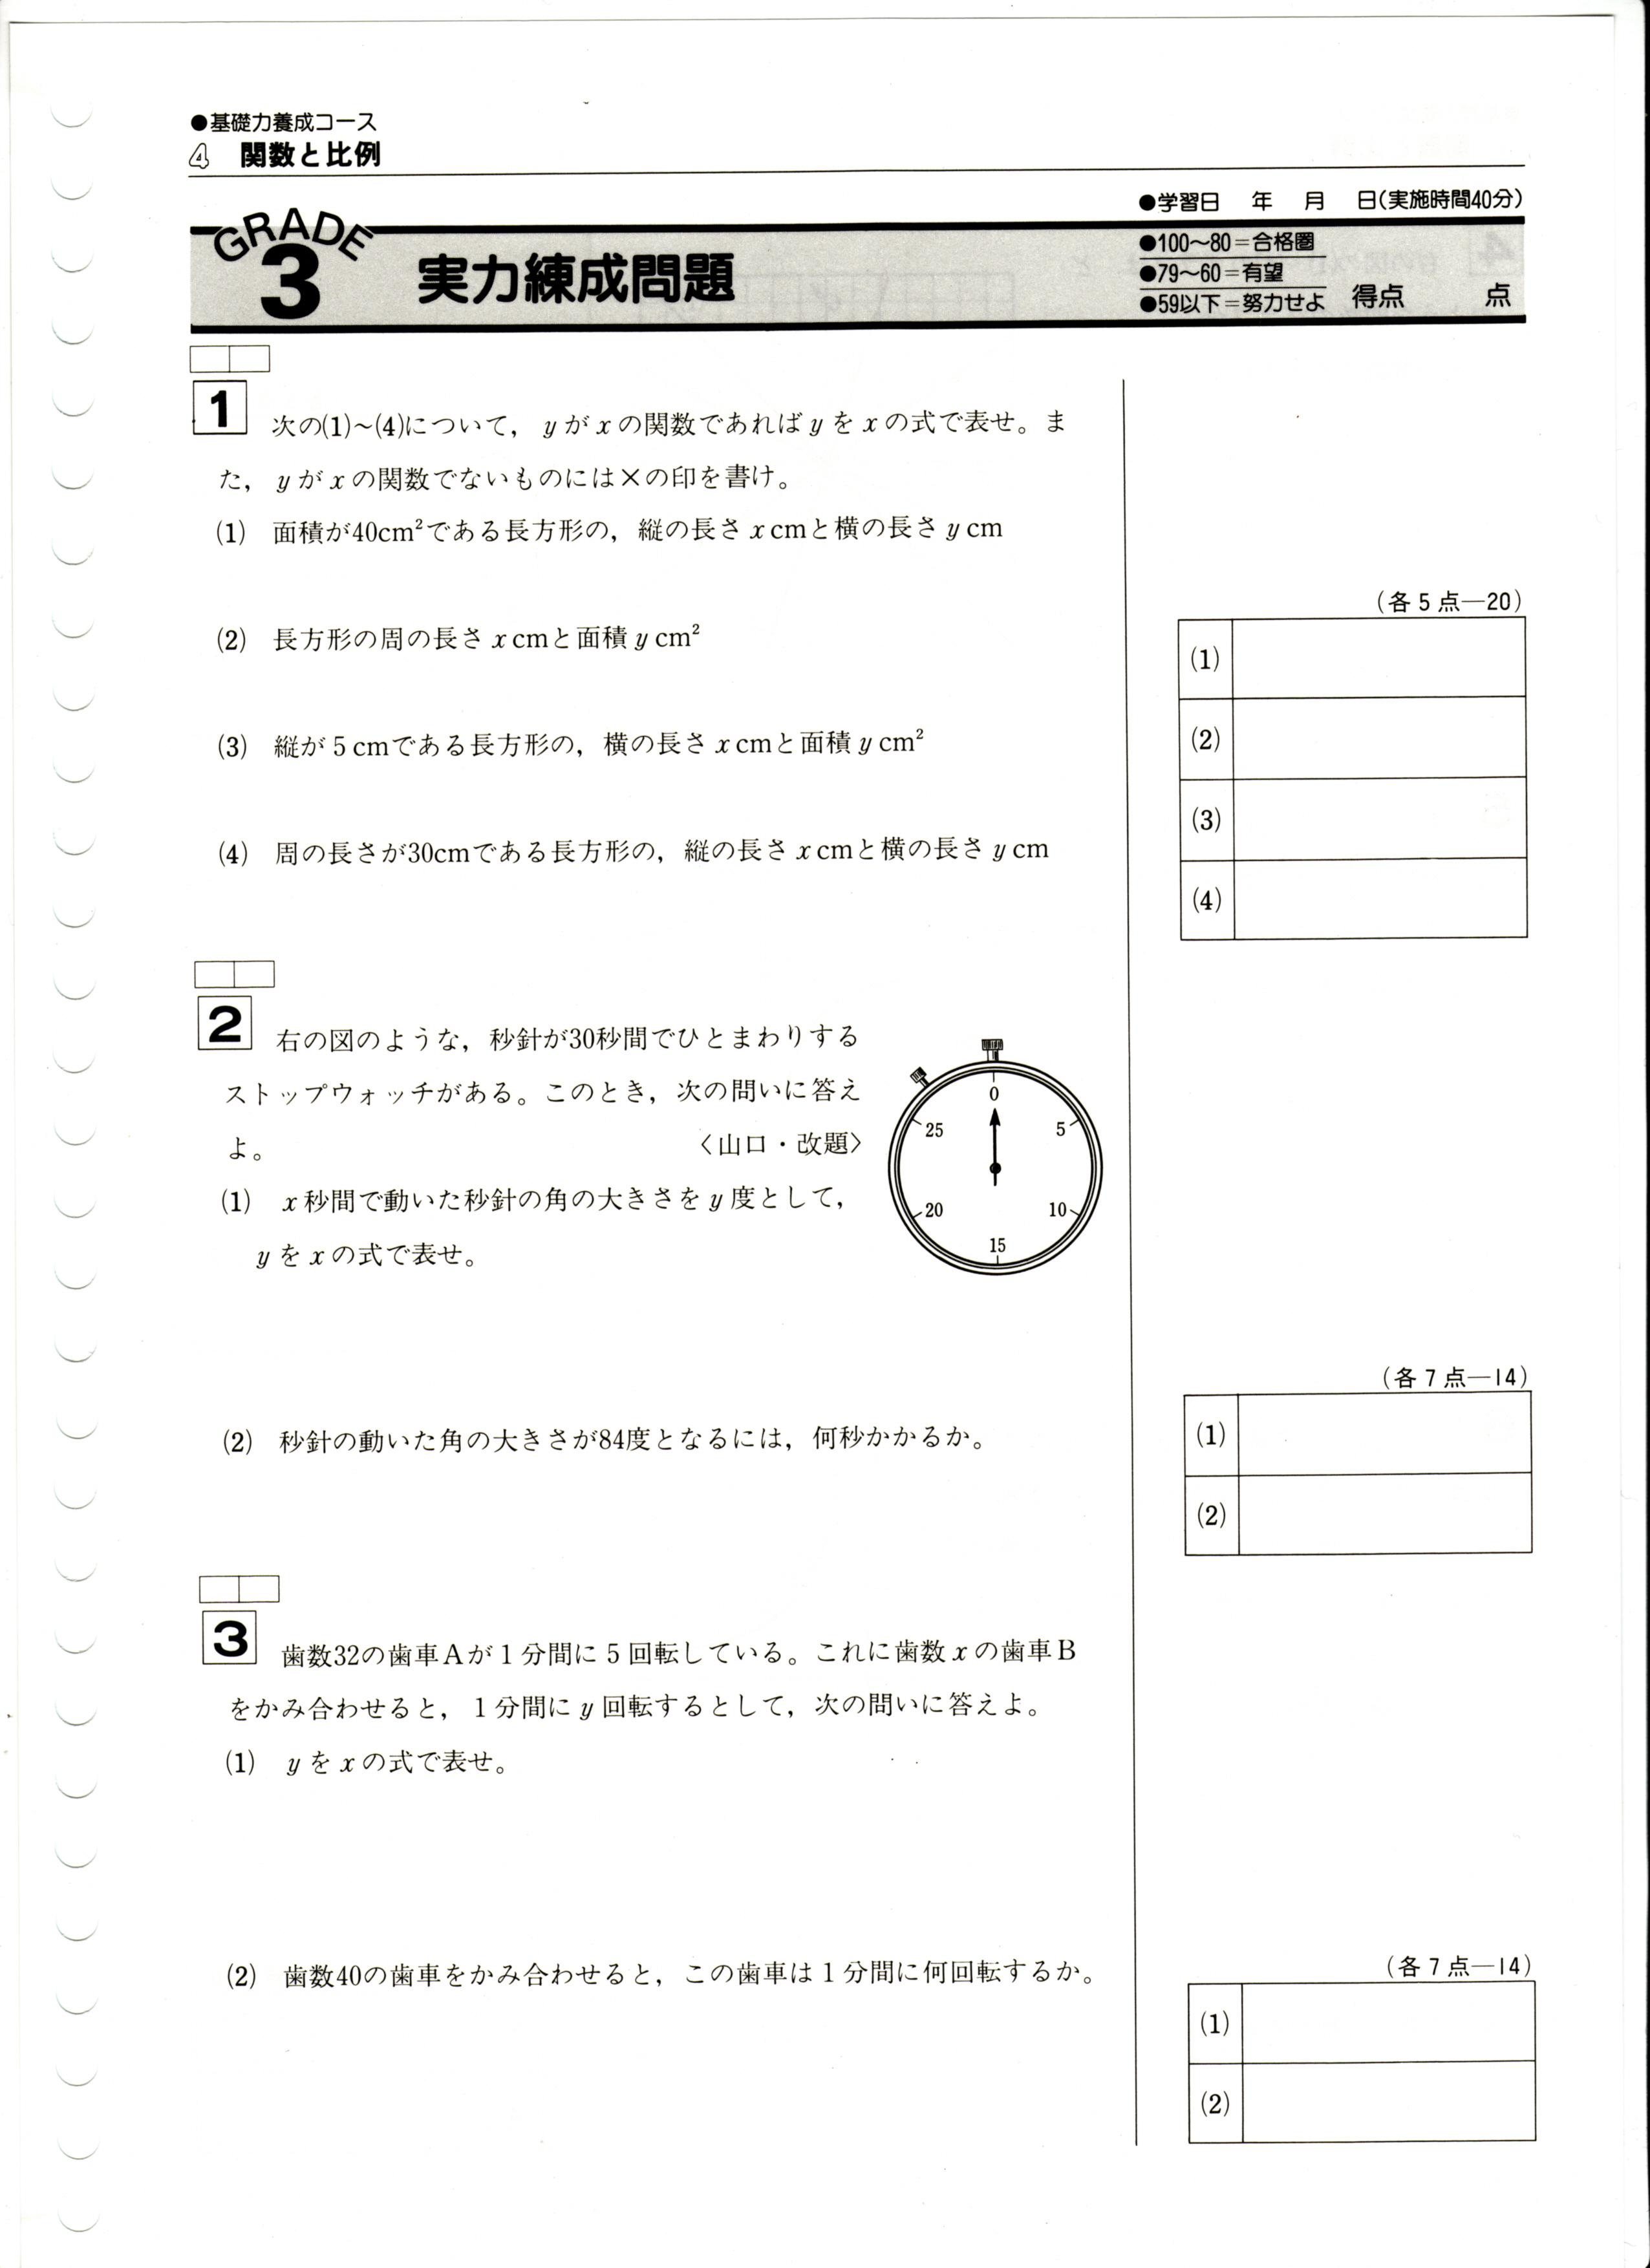 高校受験教材 グレード2 実力練成問題 数学